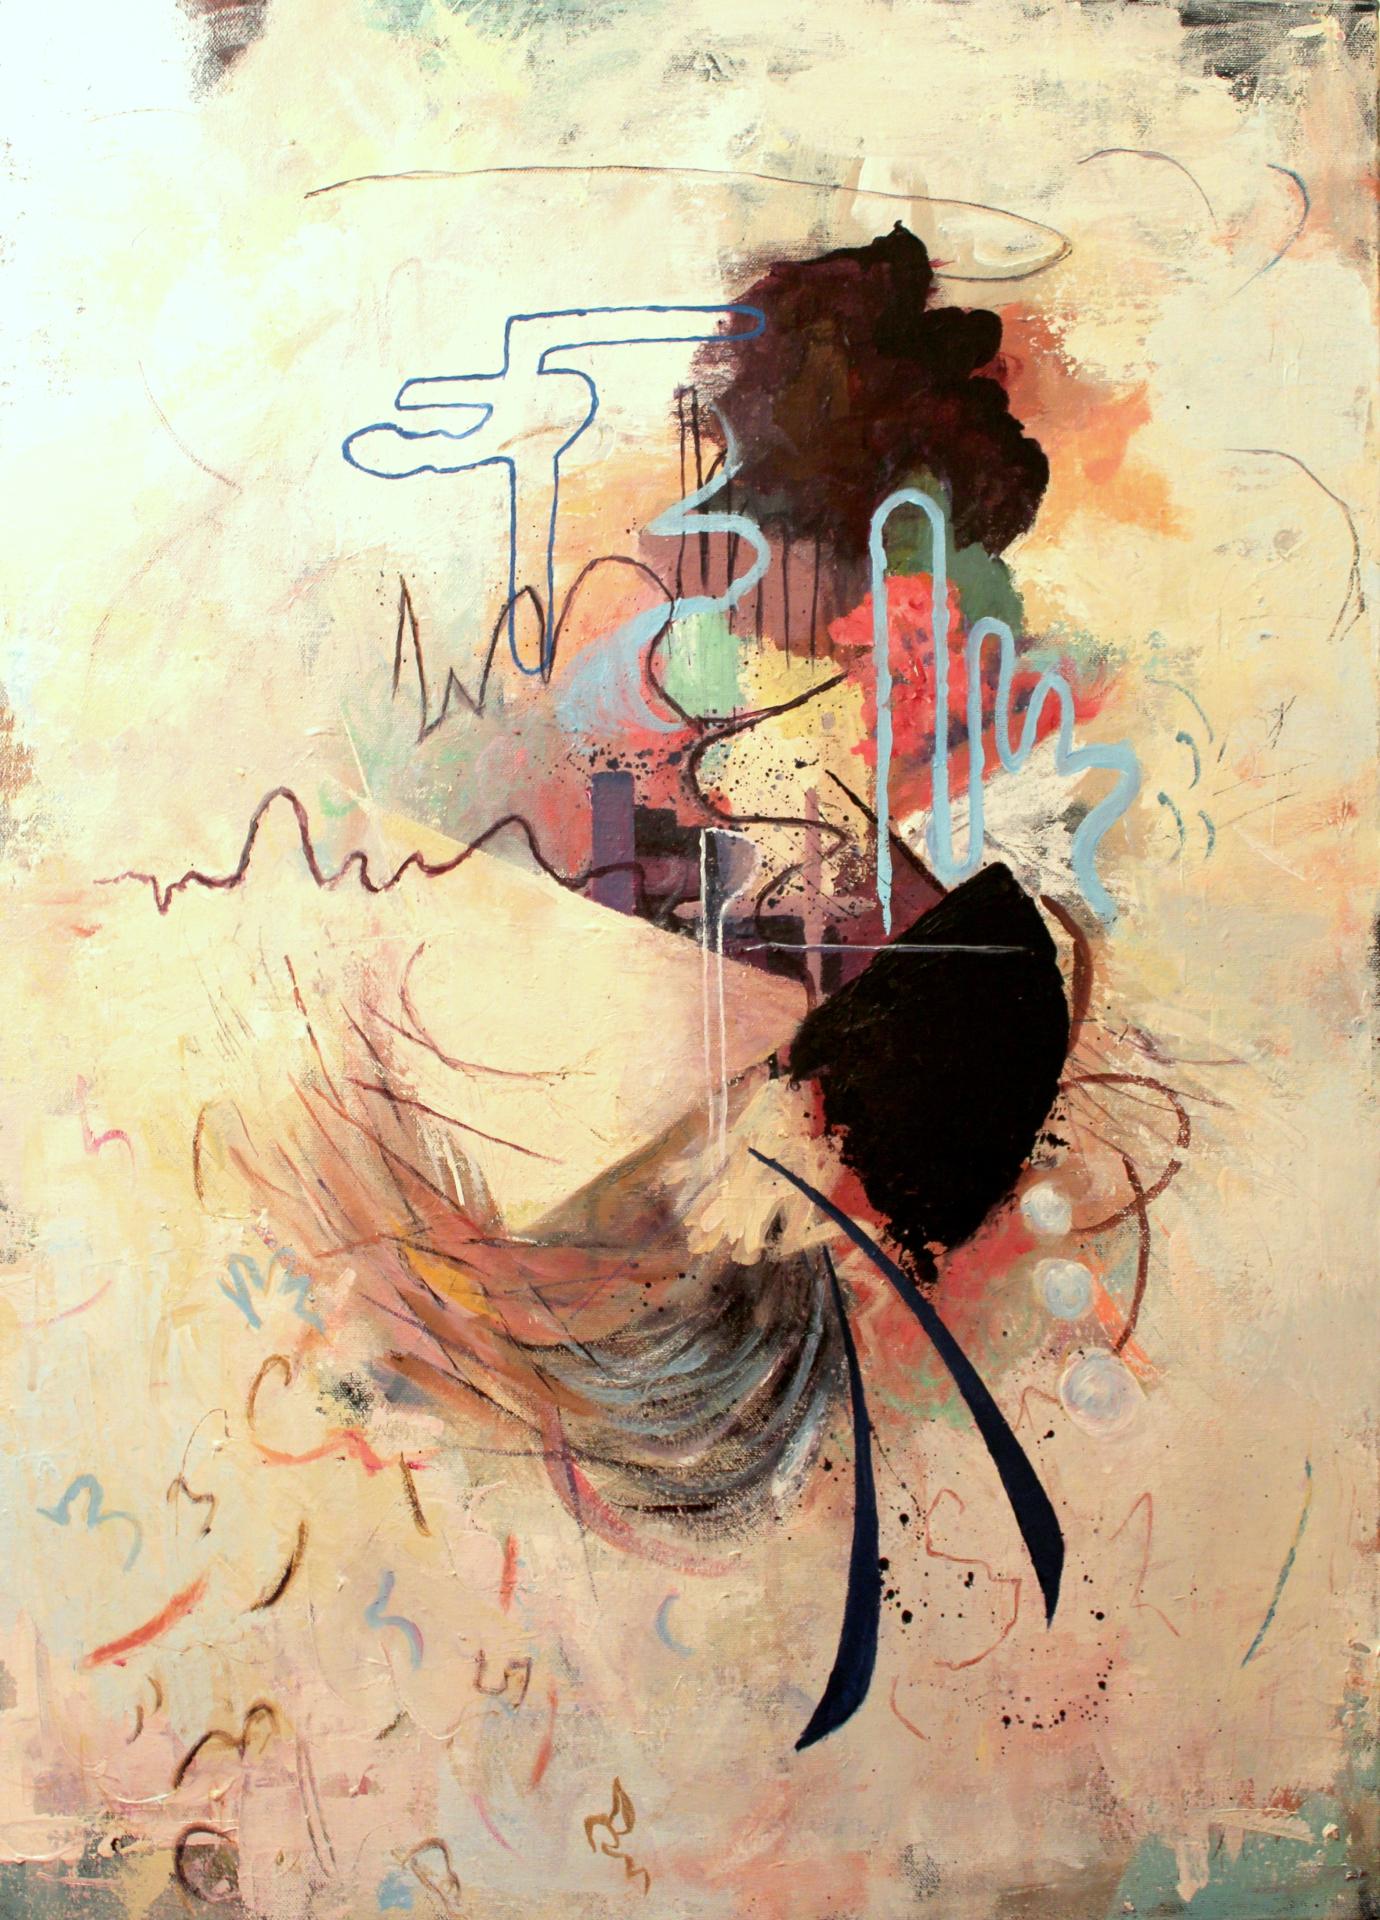 'Ascension'  2015. Acrylic on canvas. 70 cm x 50 cm